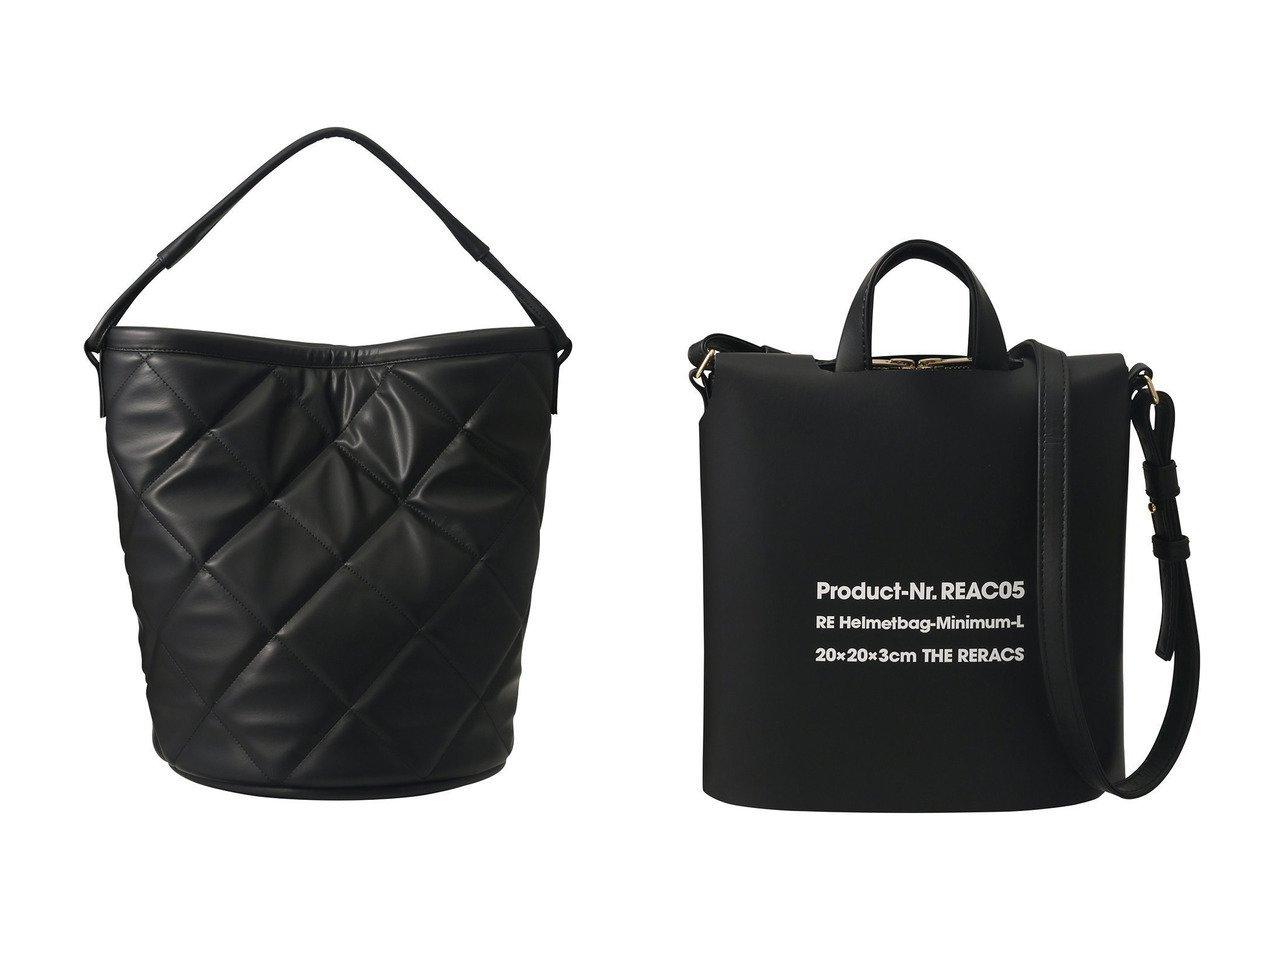 【THE RERACS/ザ リラクス】のキルトバケットバッグ&ミニマムヘルメットバッグ+カバー バッグ・鞄のおすすめ!人気、トレンド・レディースファッションの通販 おすすめで人気の流行・トレンド、ファッションの通販商品 メンズファッション・キッズファッション・インテリア・家具・レディースファッション・服の通販 founy(ファニー) https://founy.com/ ファッション Fashion レディースファッション WOMEN バッグ Bag 2021年 2021 2021 春夏 S/S SS Spring/Summer 2021 S/S 春夏 SS Spring/Summer キルティング シンプル ハンドバッグ バケツ マグネット 春 Spring |ID:crp329100000014986